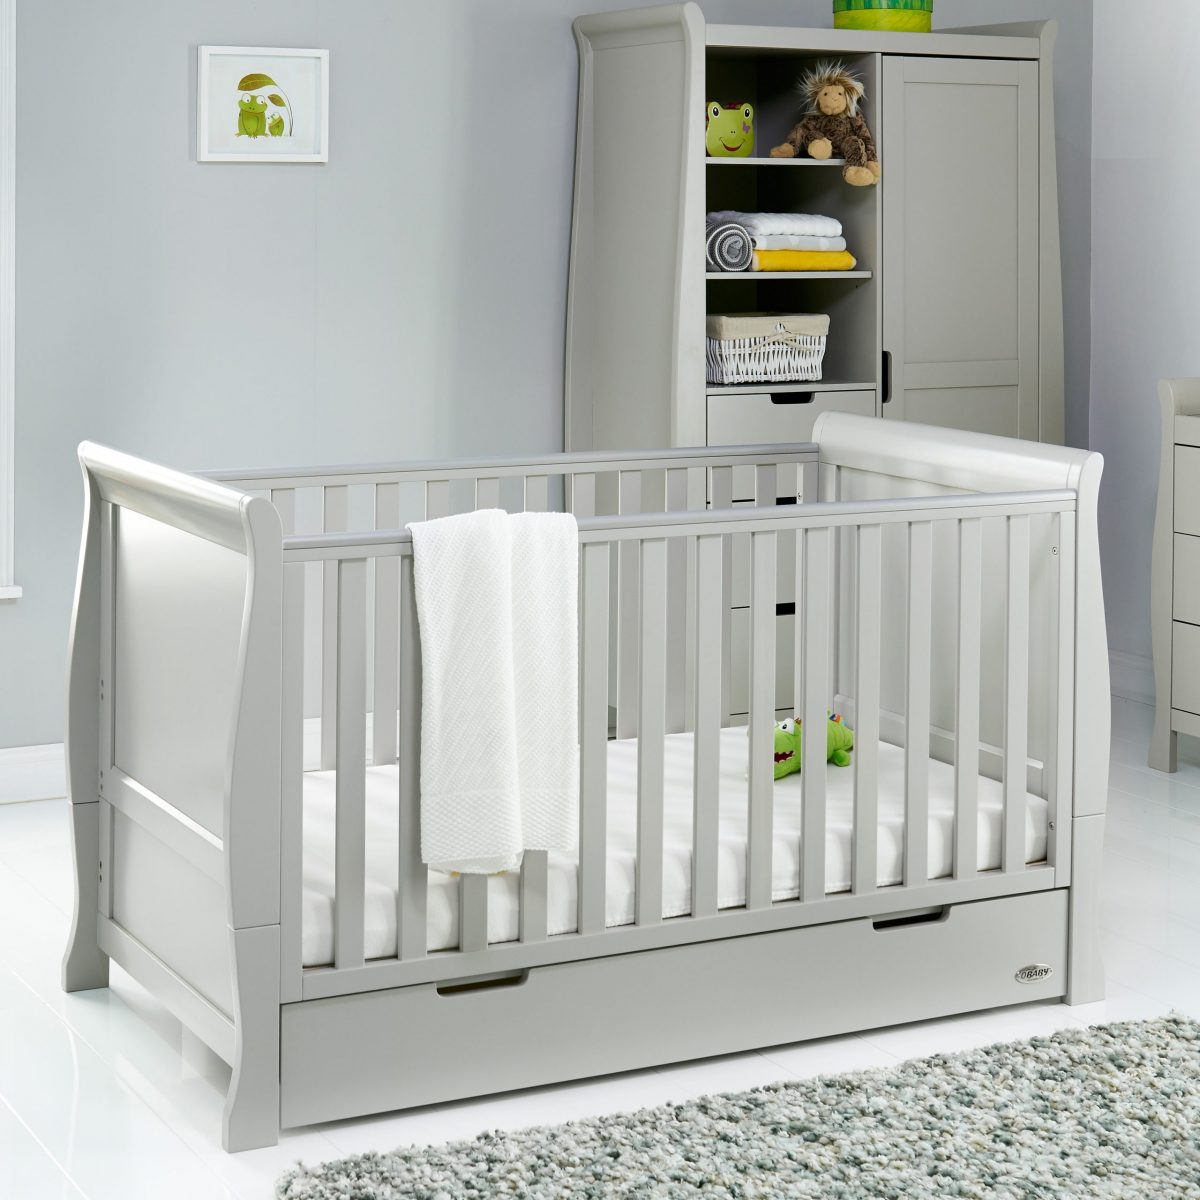 Stamford Classic Nursery Set - Warm Grey